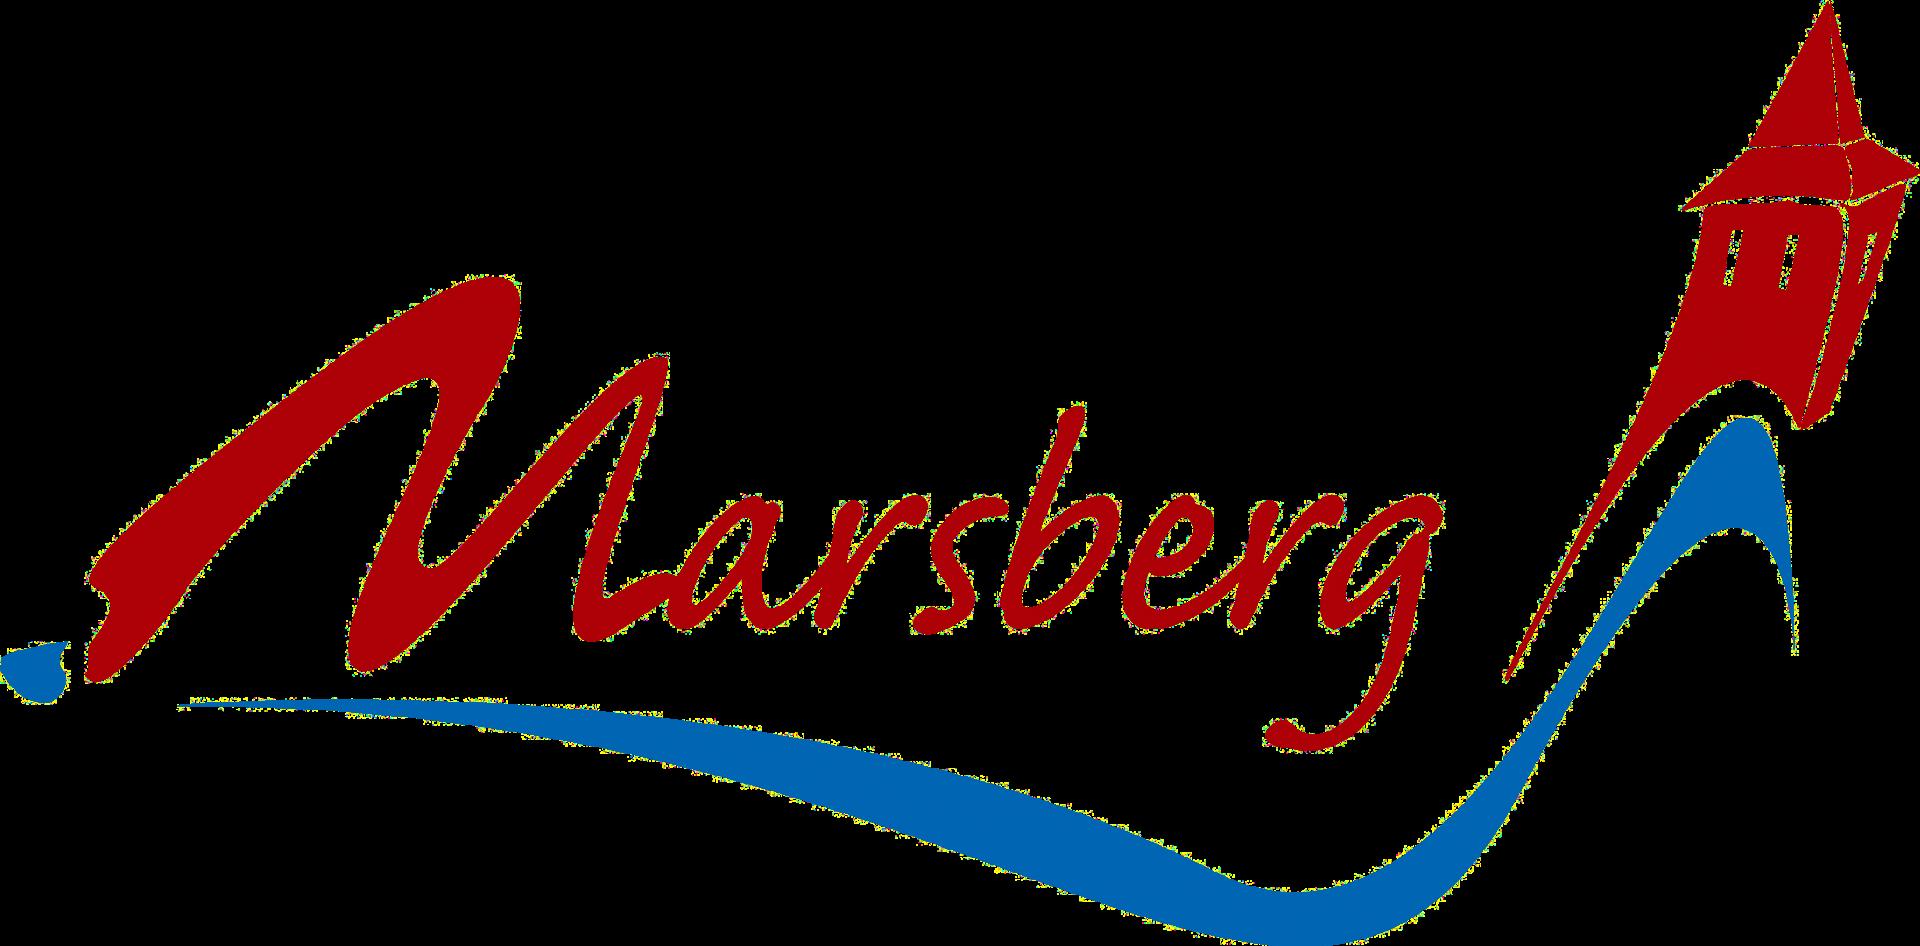 Stadt Marsberg